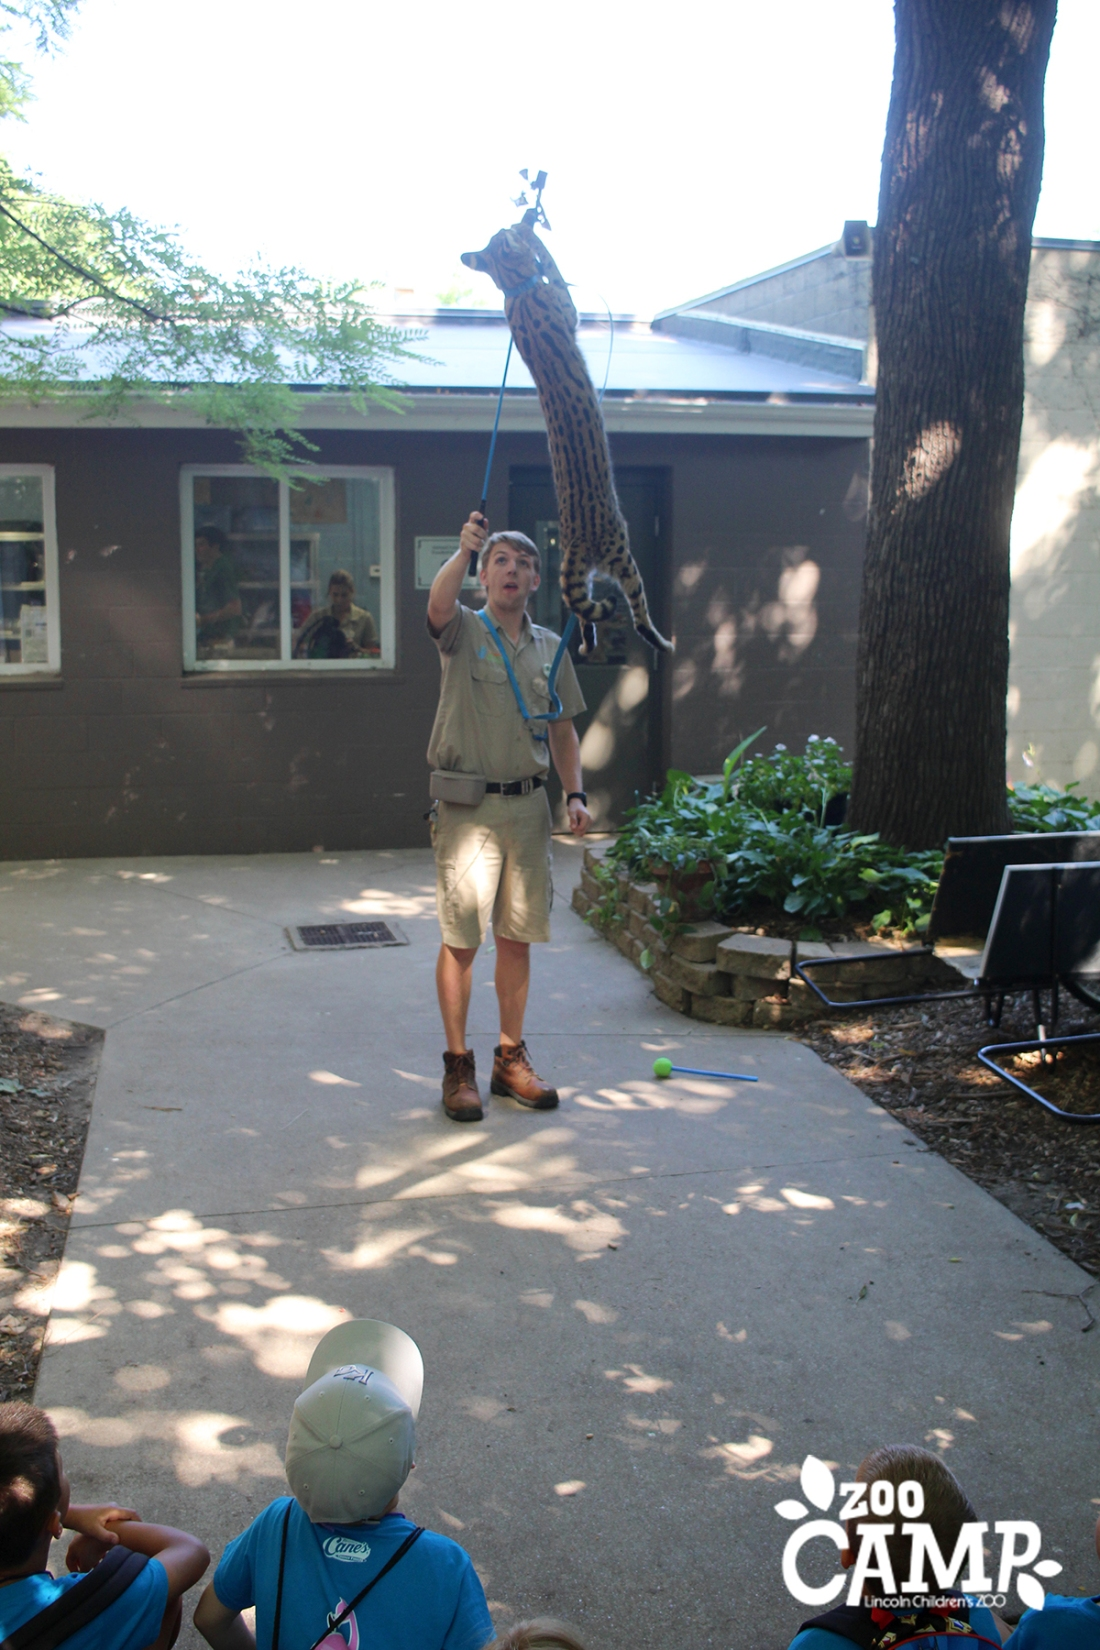 Camp_serval_4-5_3319 copy